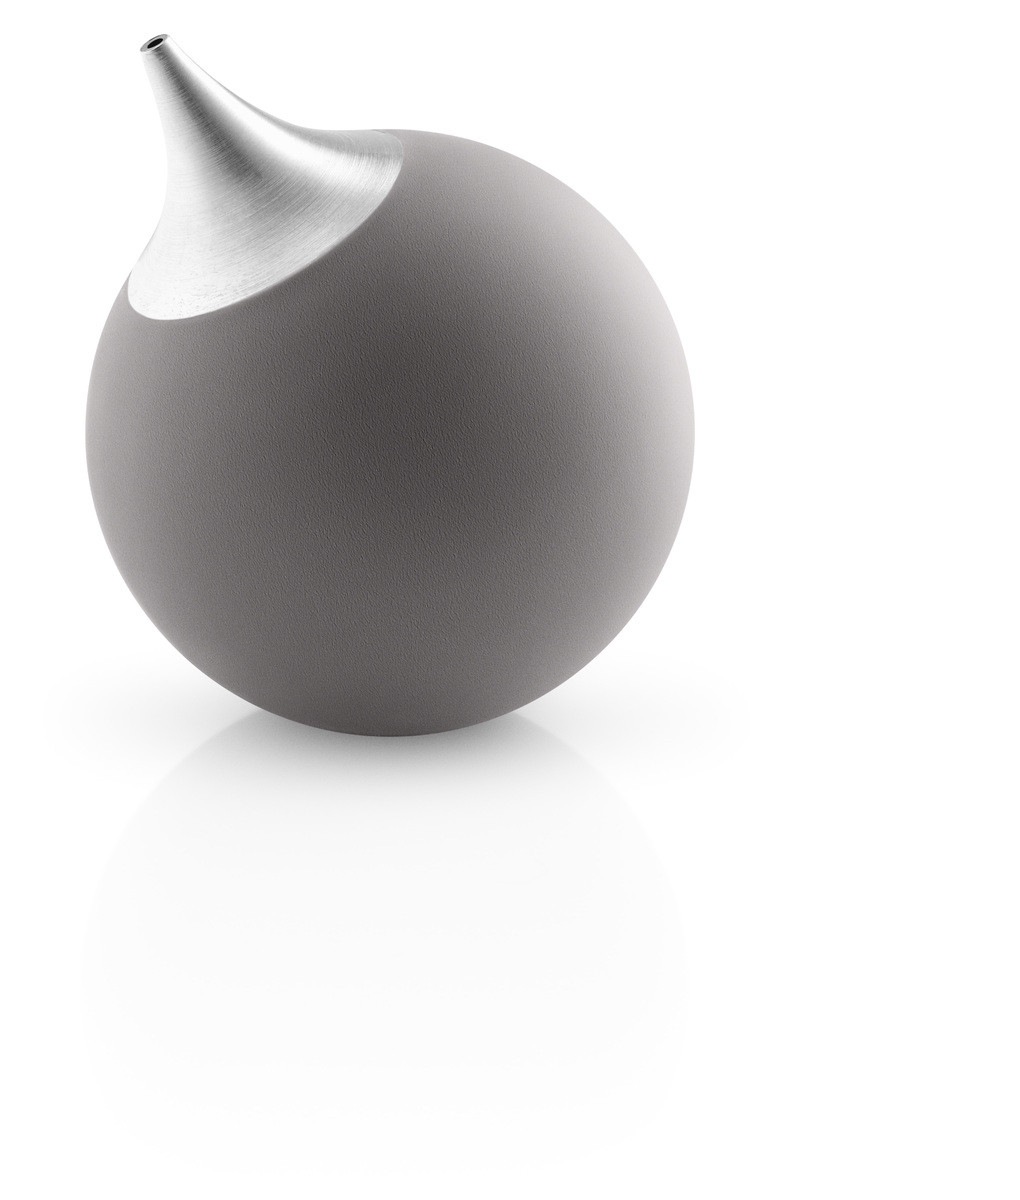 eva solo - Seifenspender - Elephant grey, 530676, 5706631204590